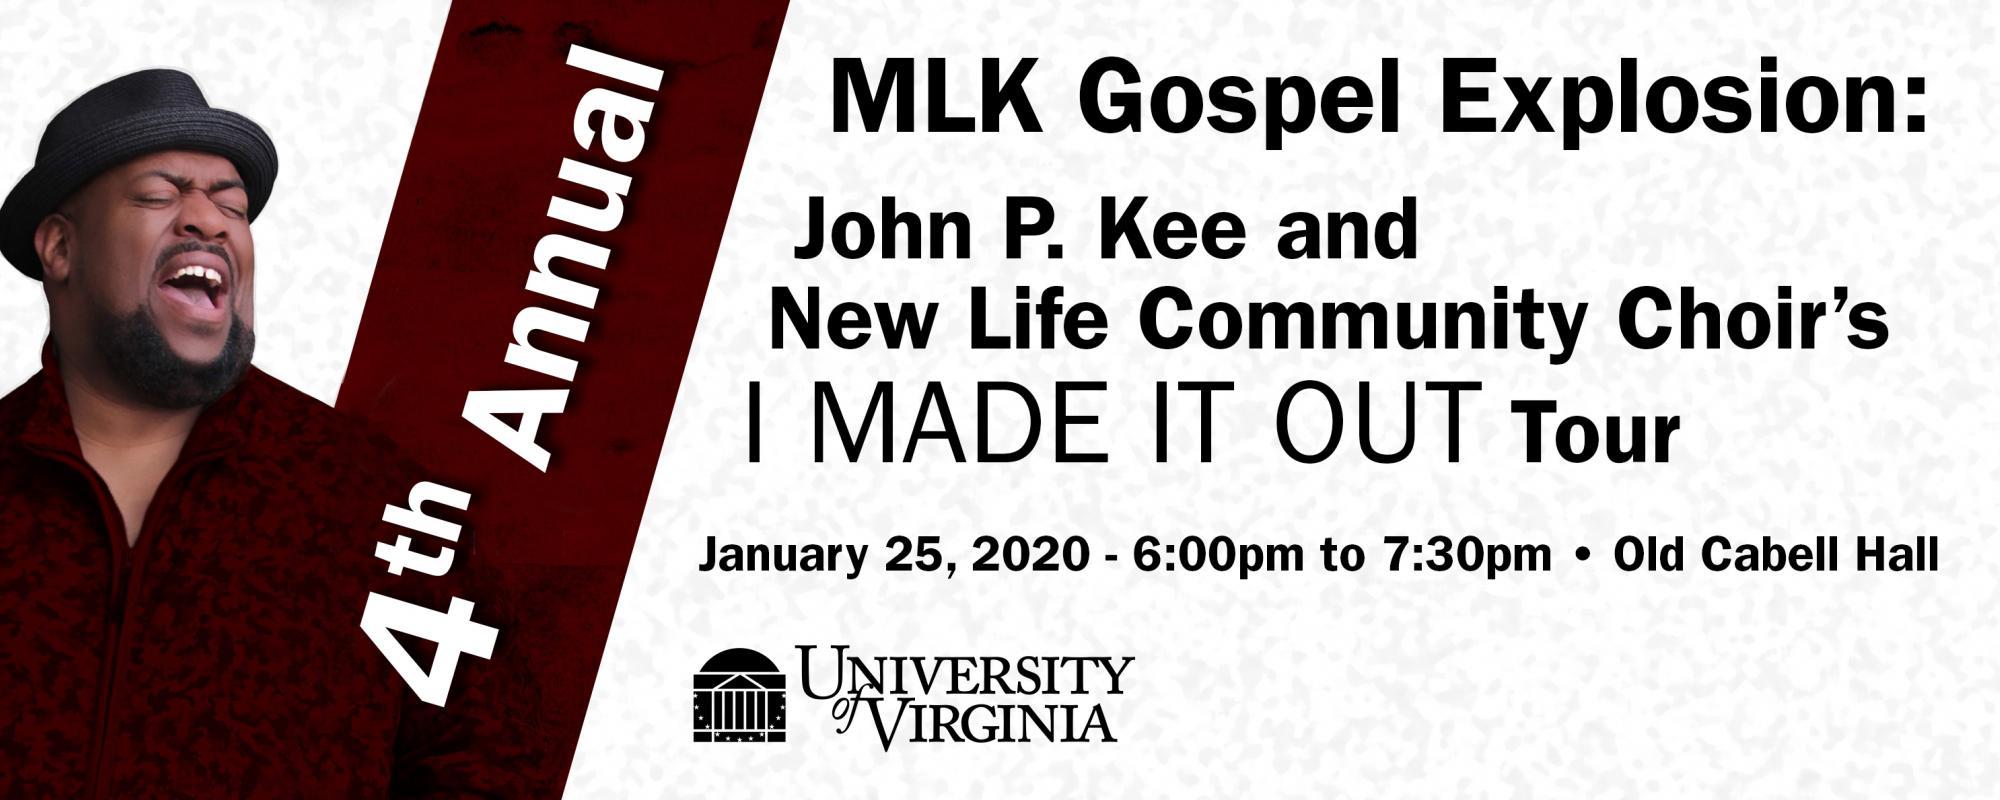 4th Annual MLK Gospel Explosion